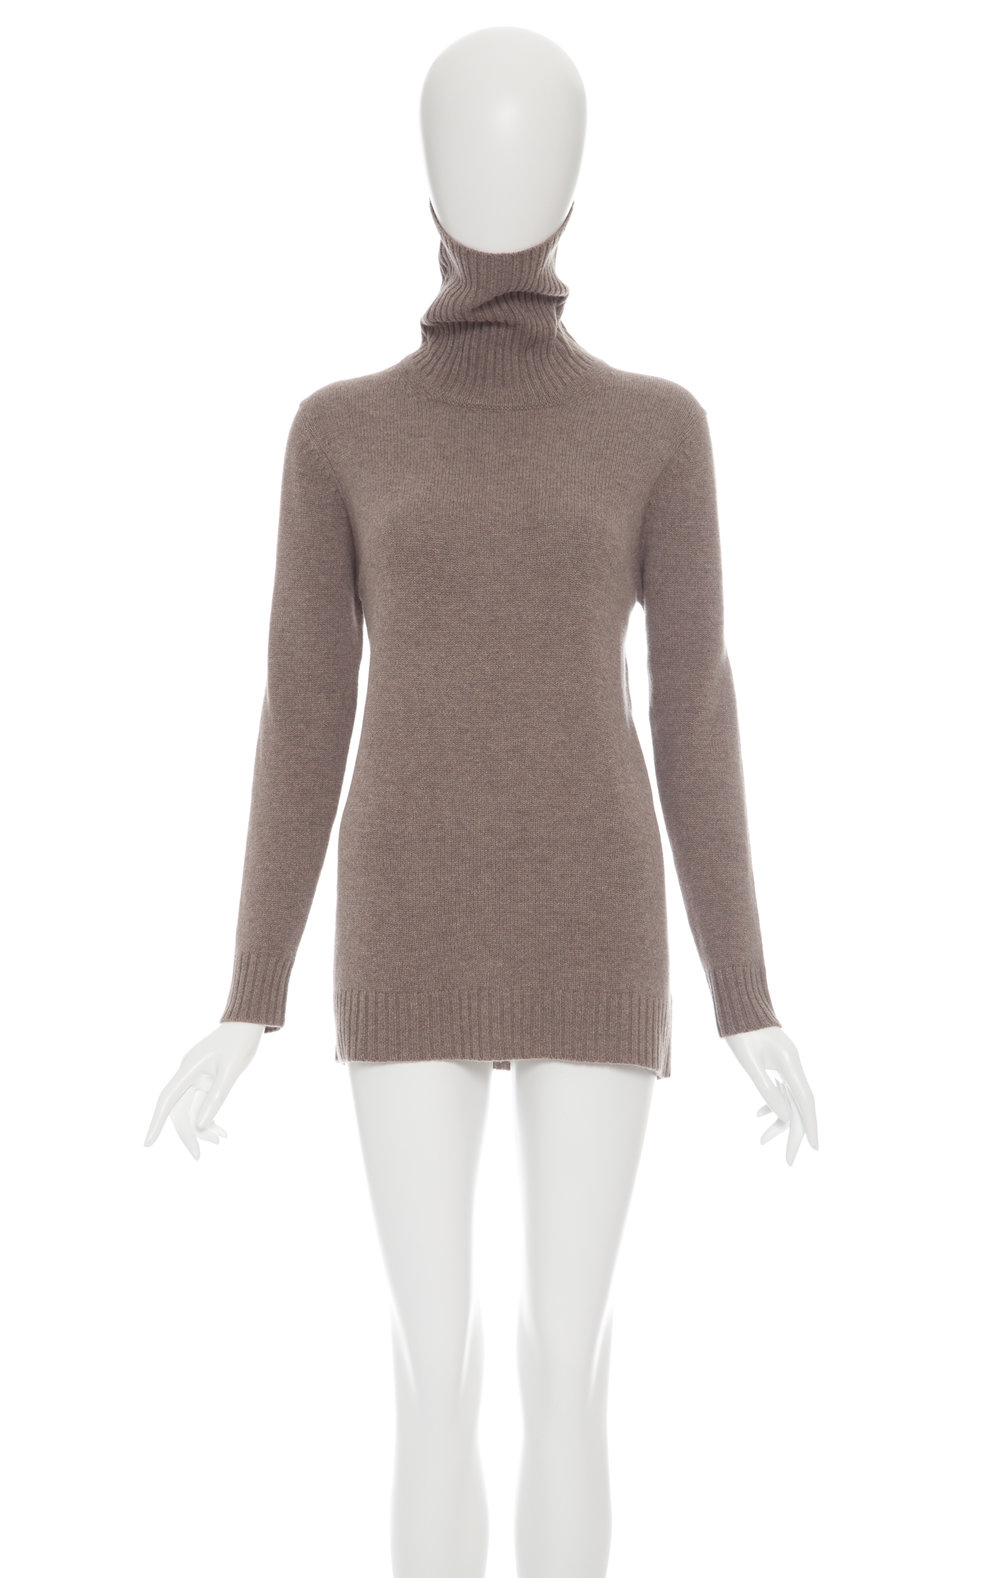 hortens-cosy long turltleneck-merino wool